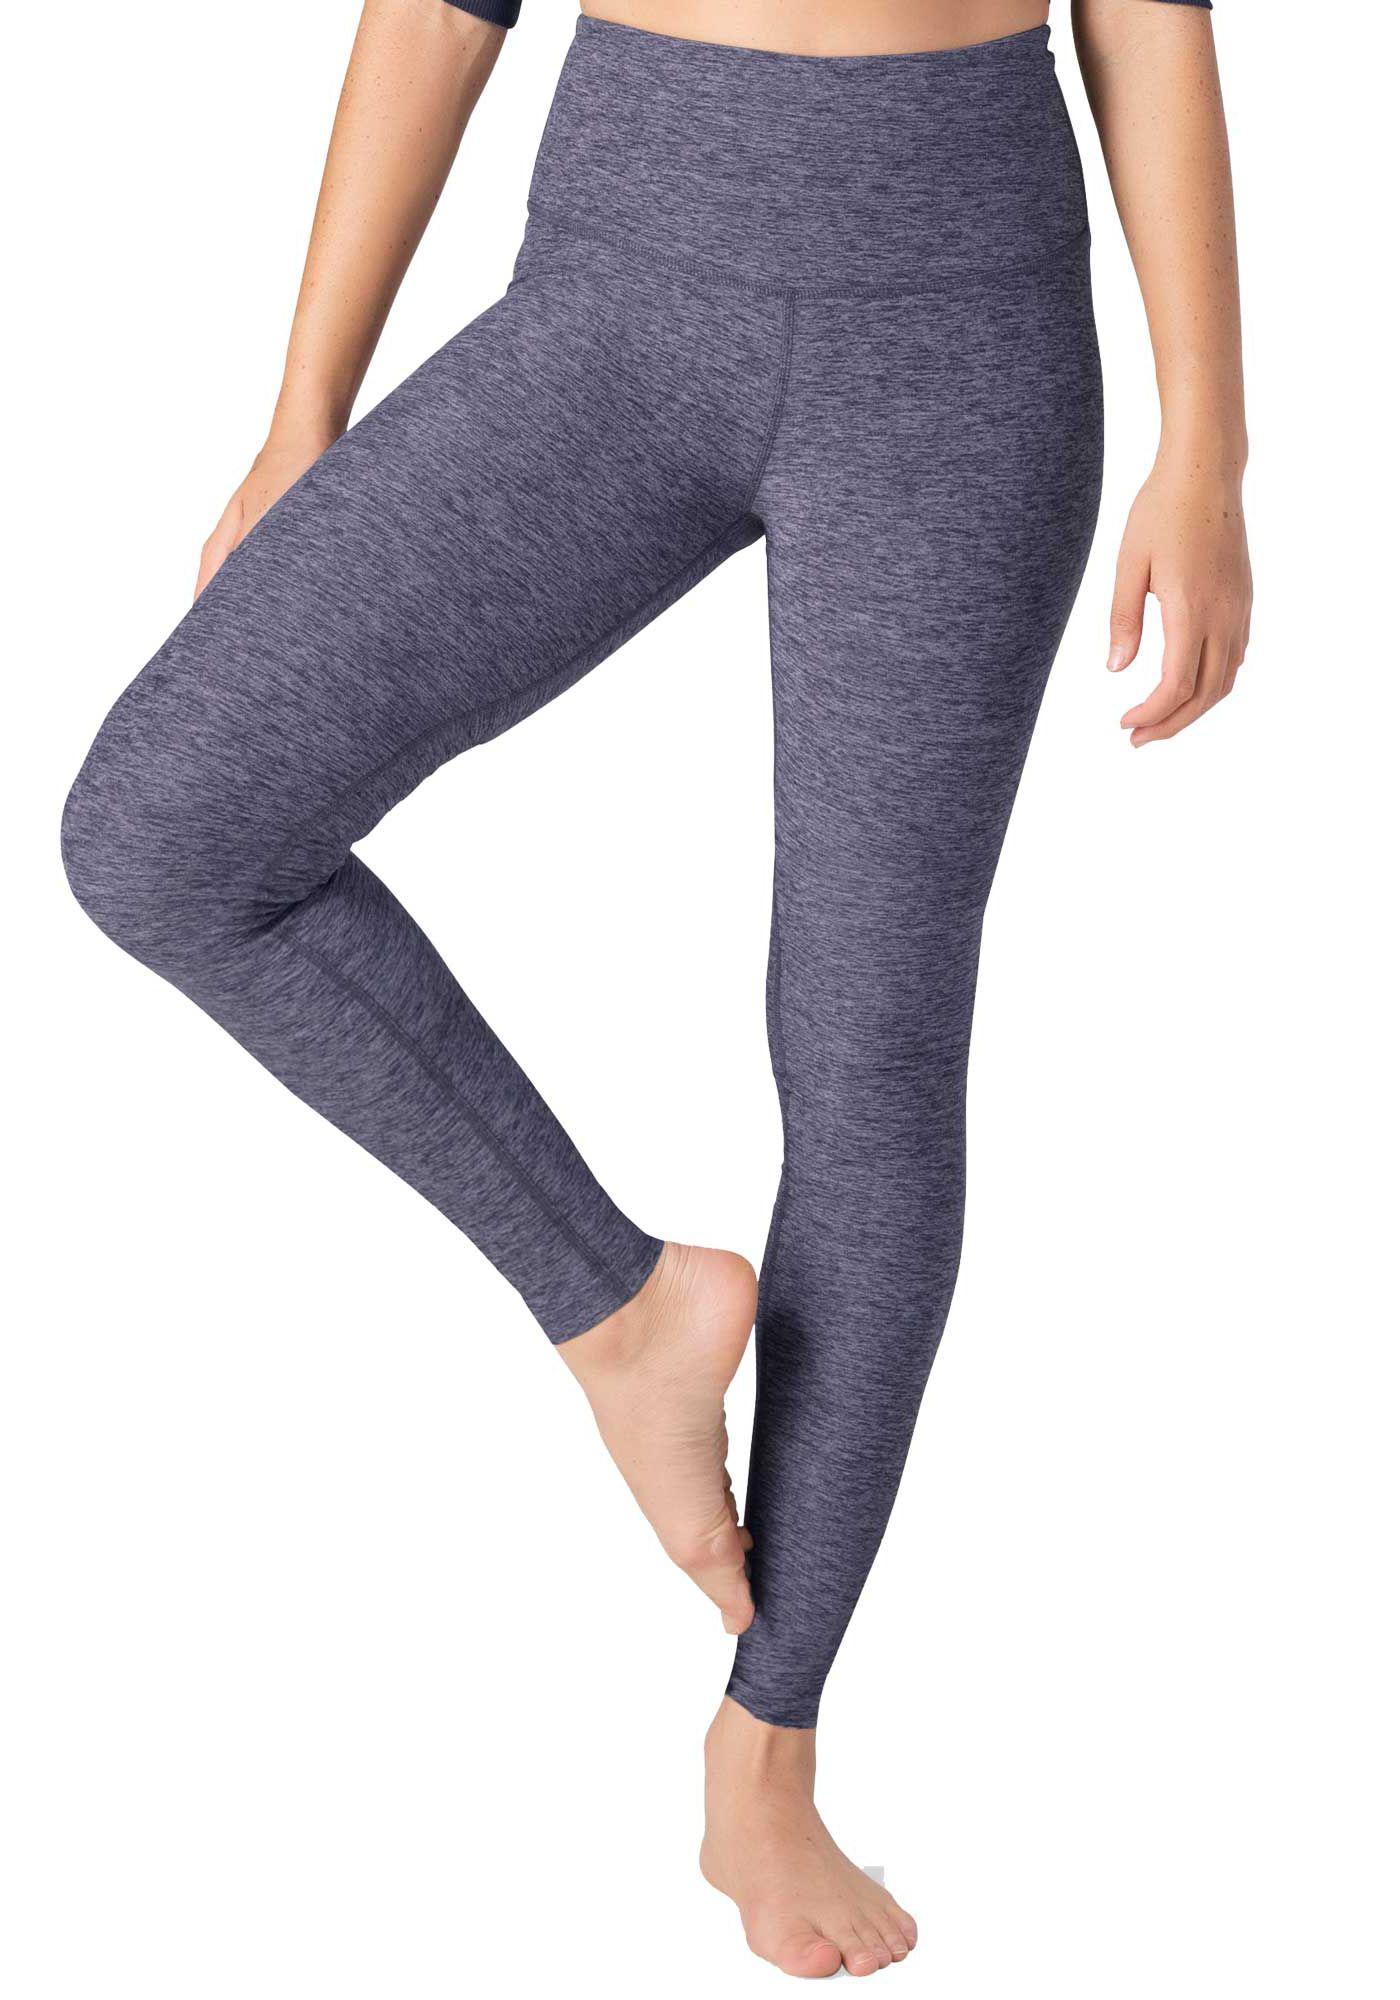 Beyond Yoga Women's SD High Waist Leggings